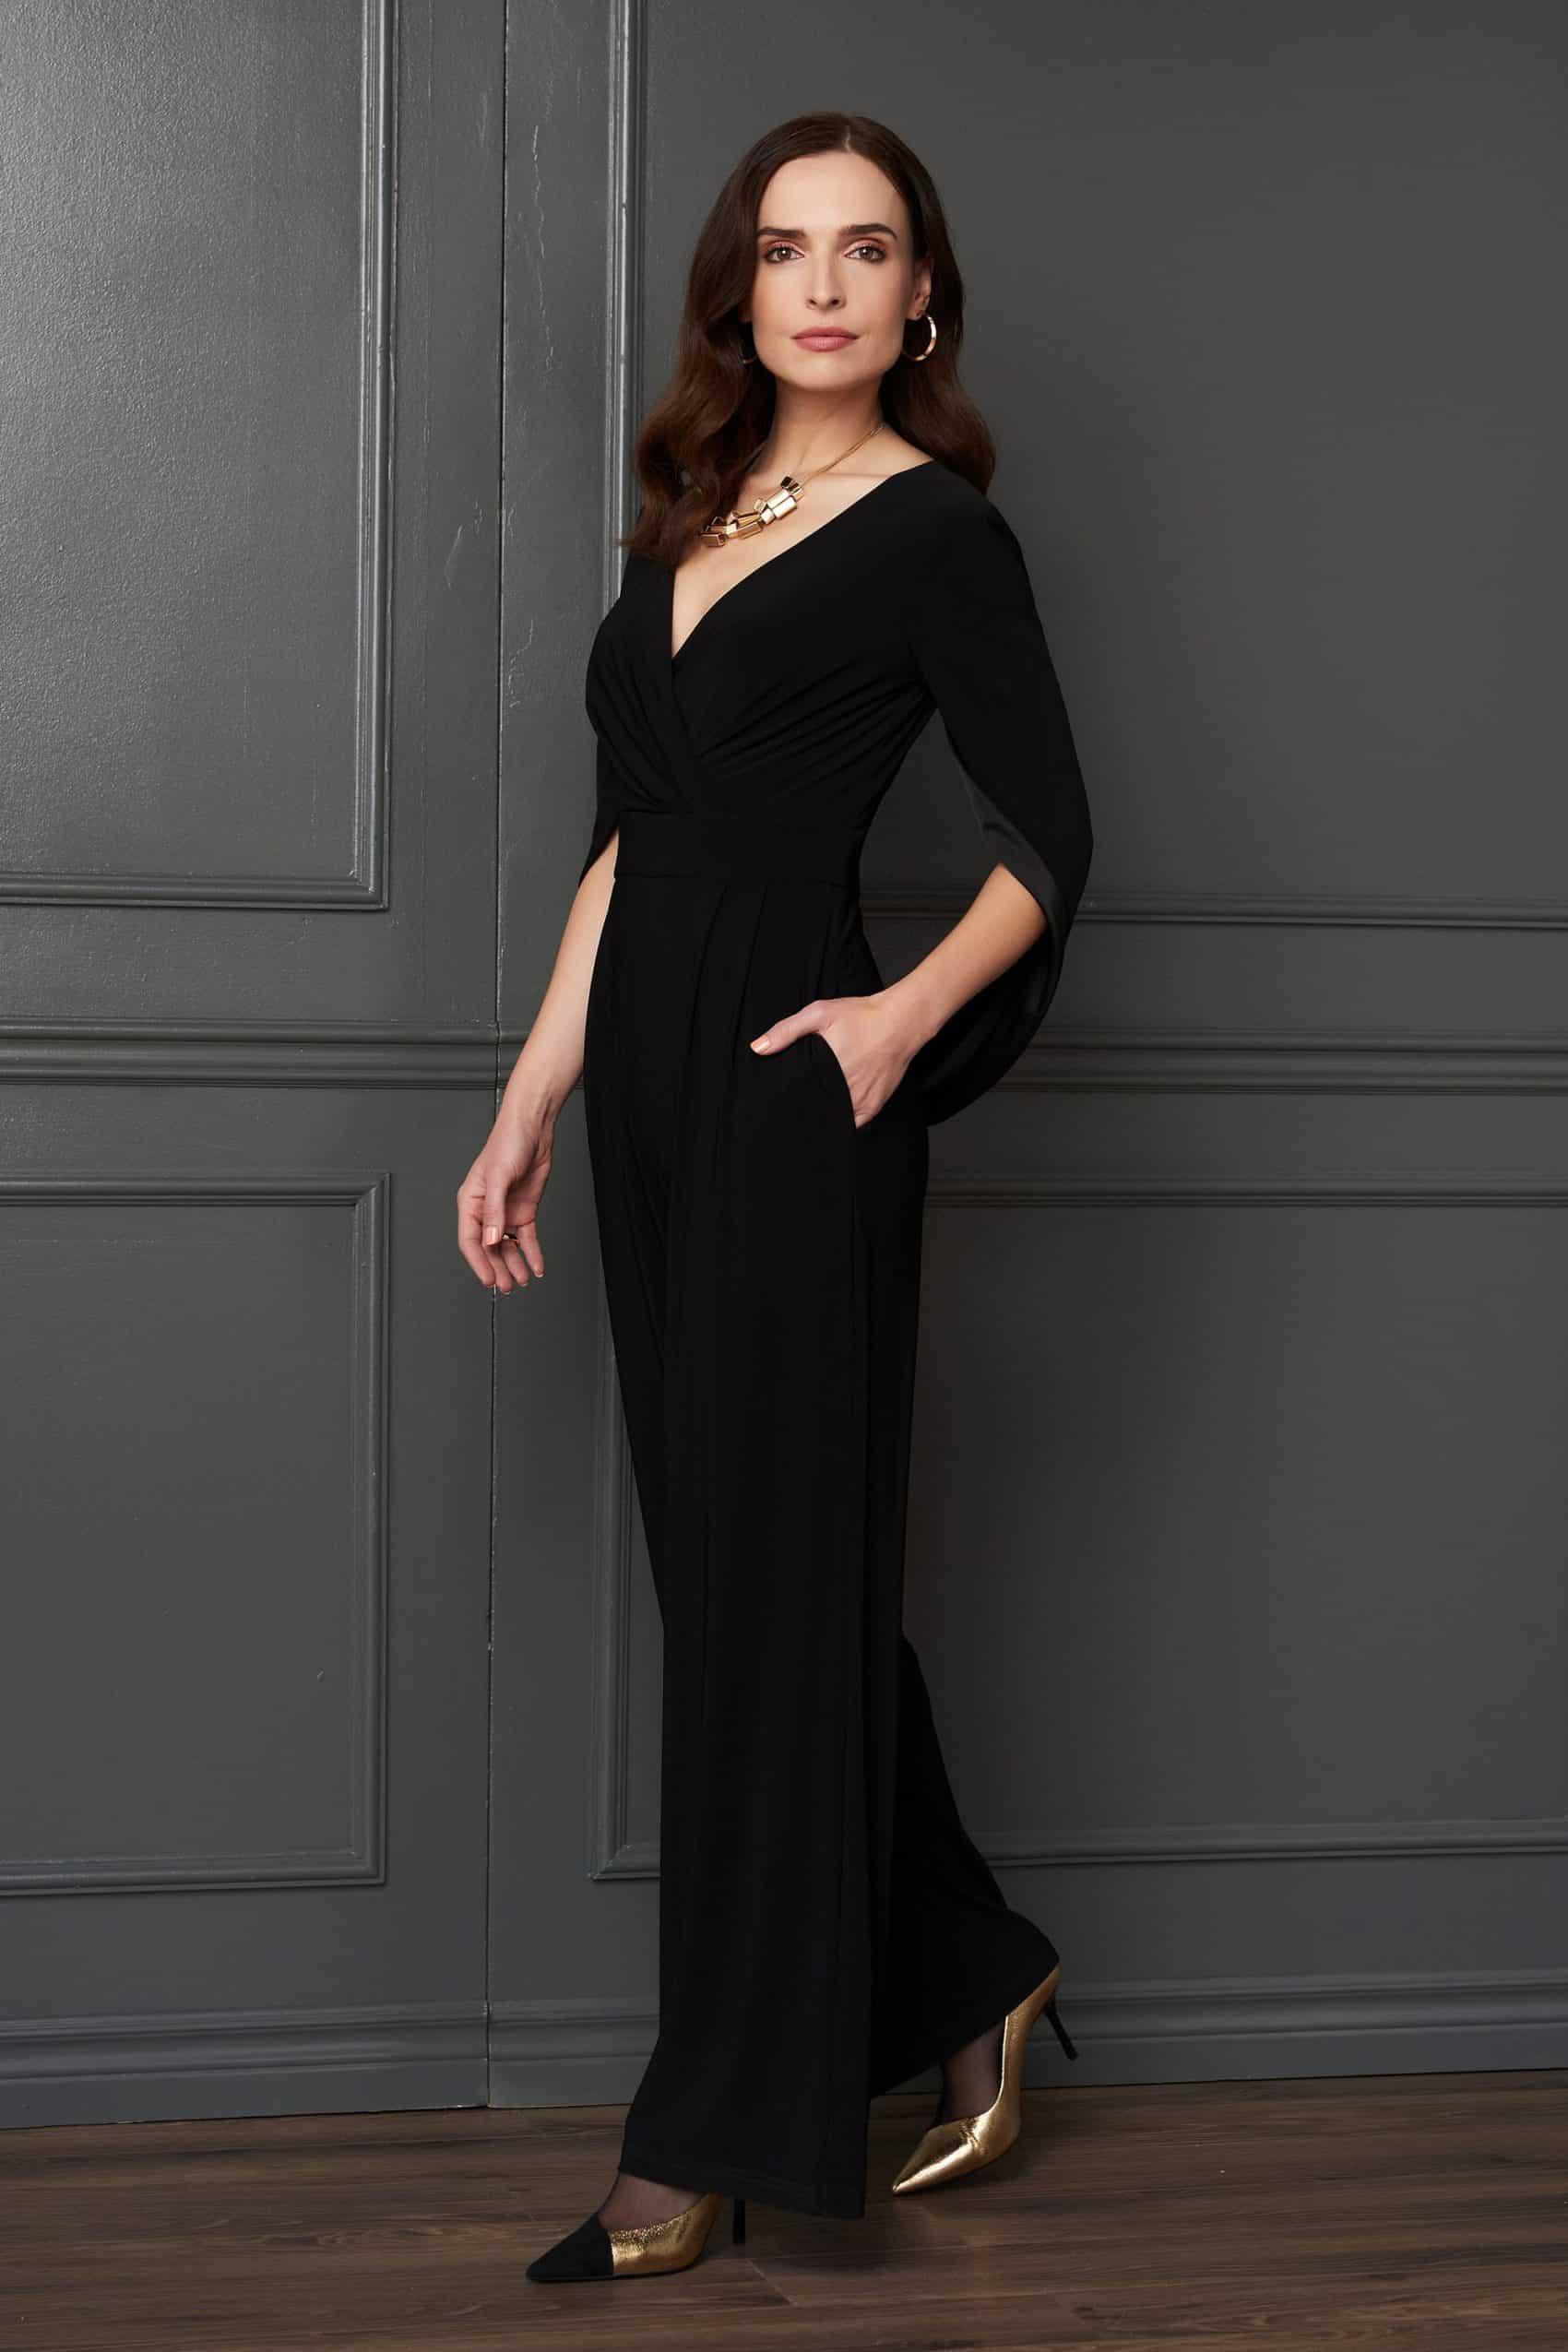 Special Events Black Dress